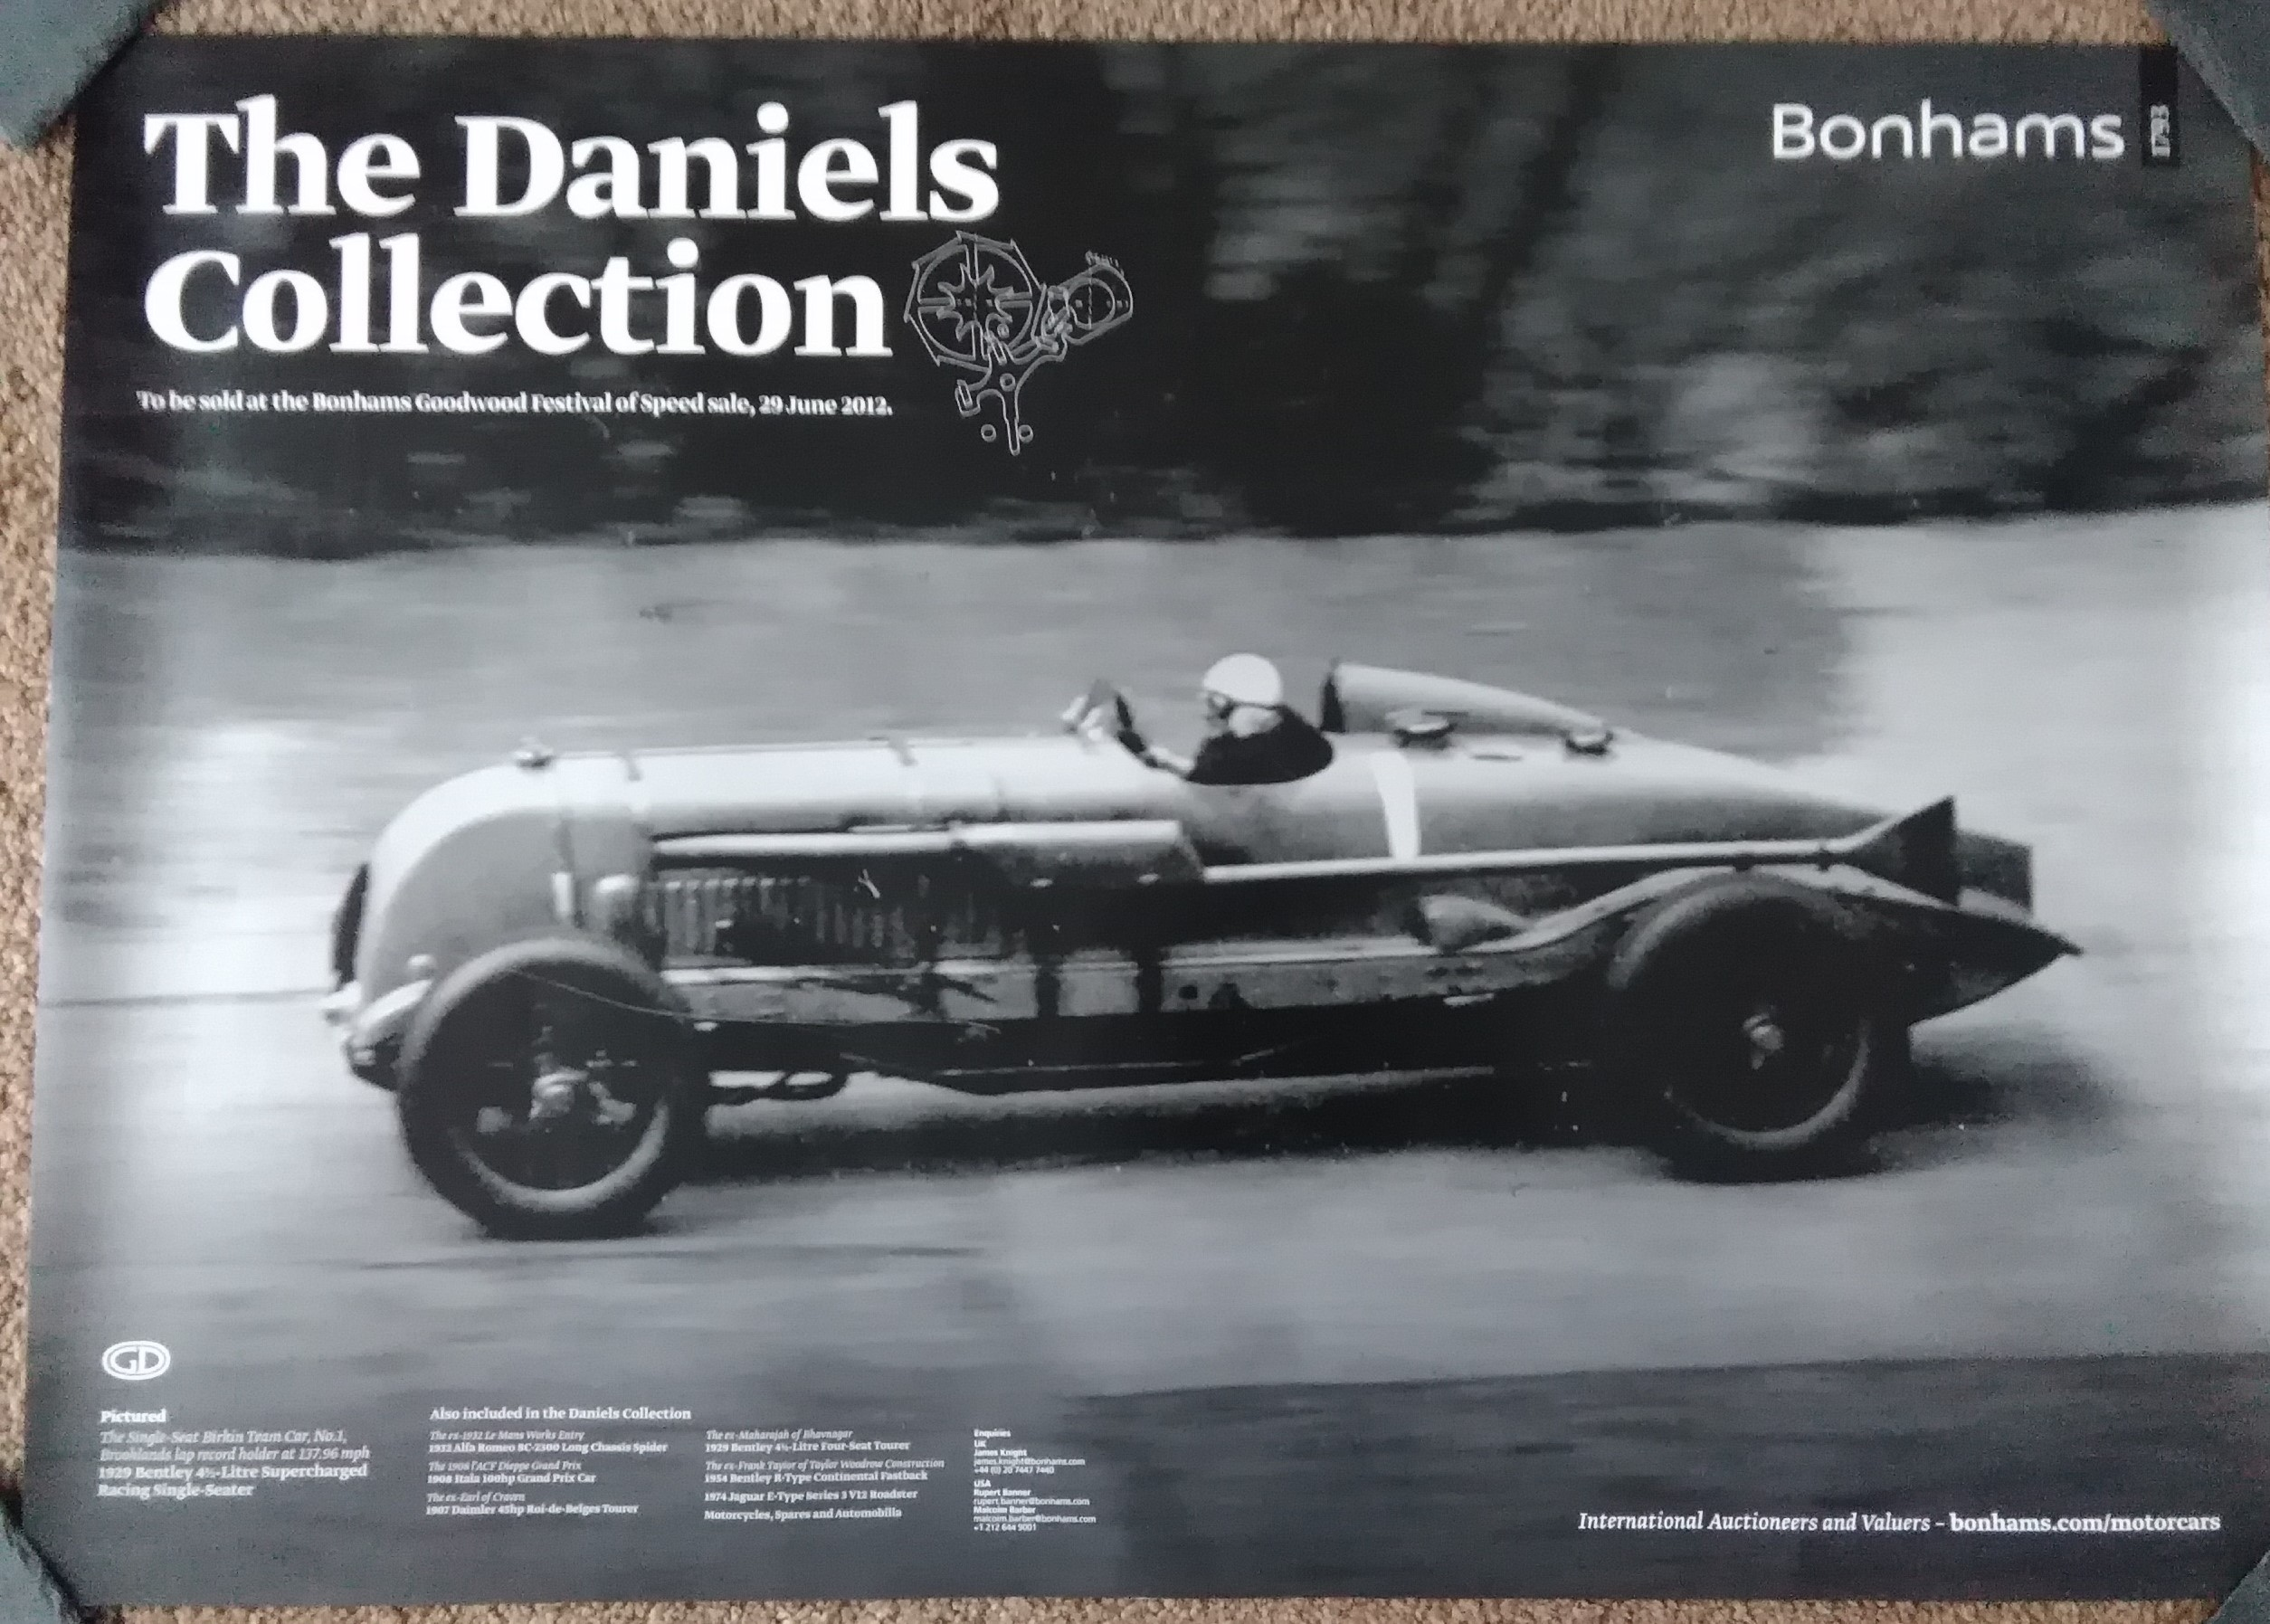 Goodwood 2012 Bonhams Auction Poster